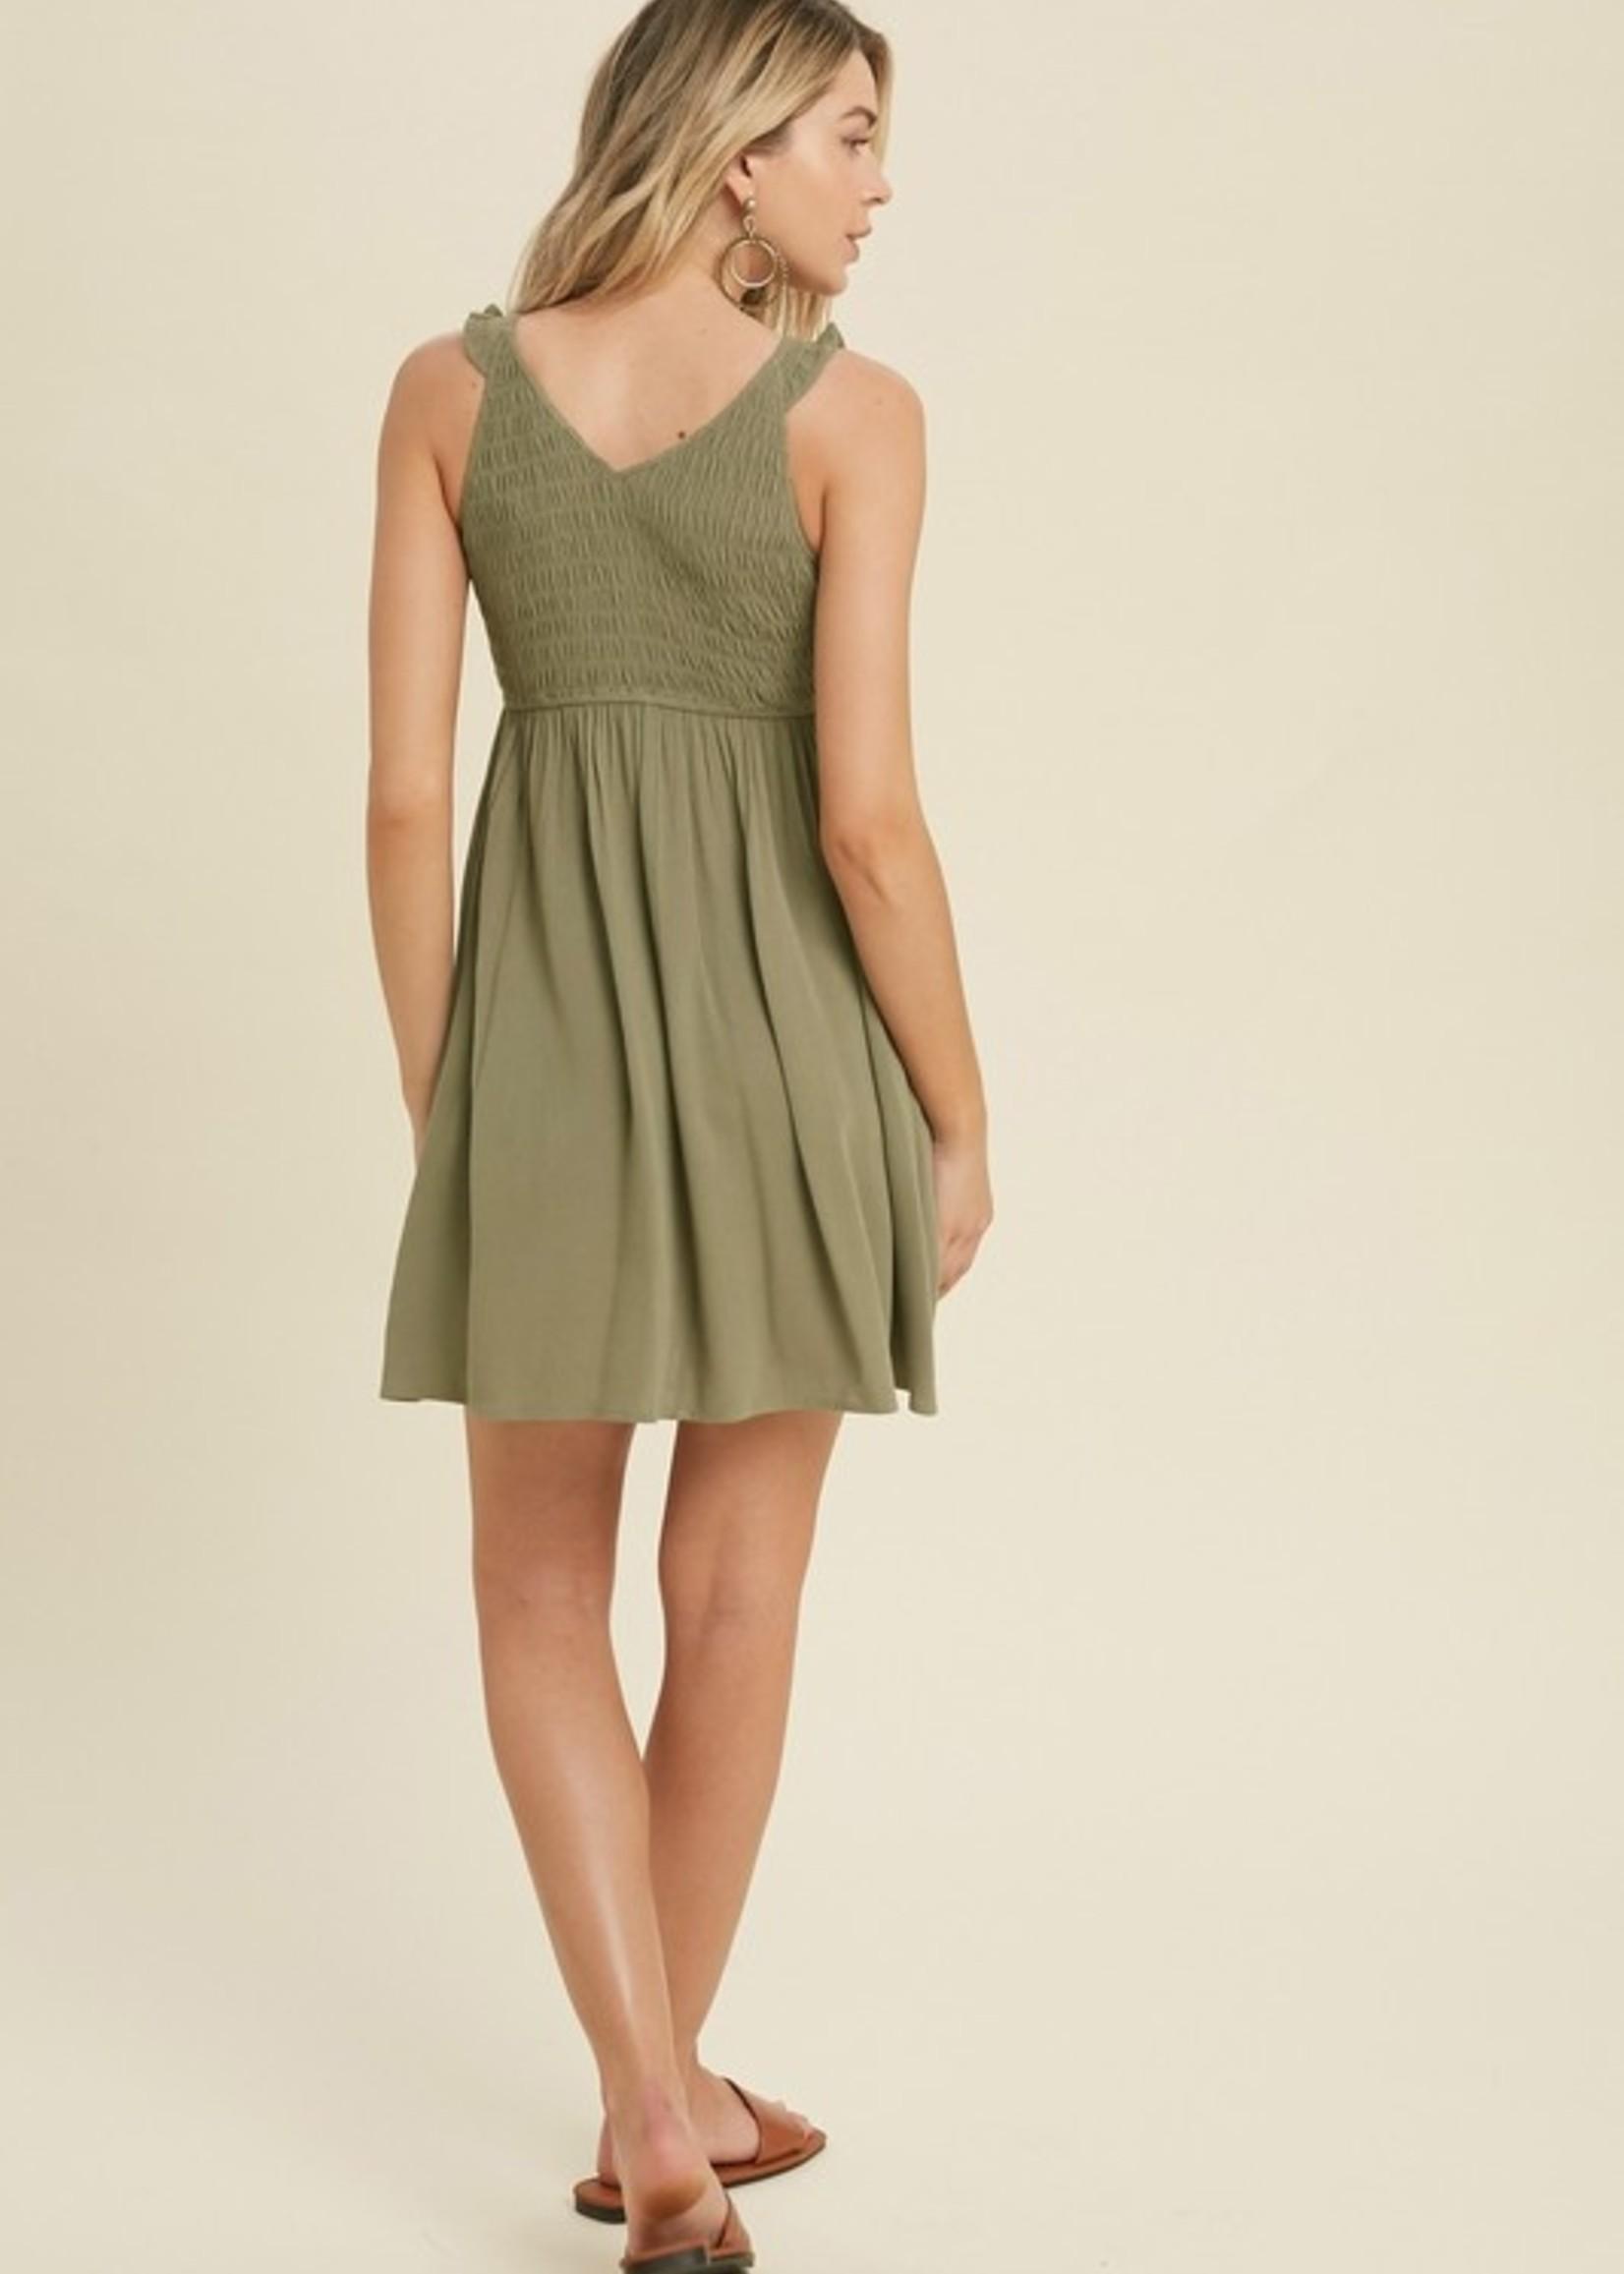 Smocked Top w/Ruffle Strap Dress - Olive